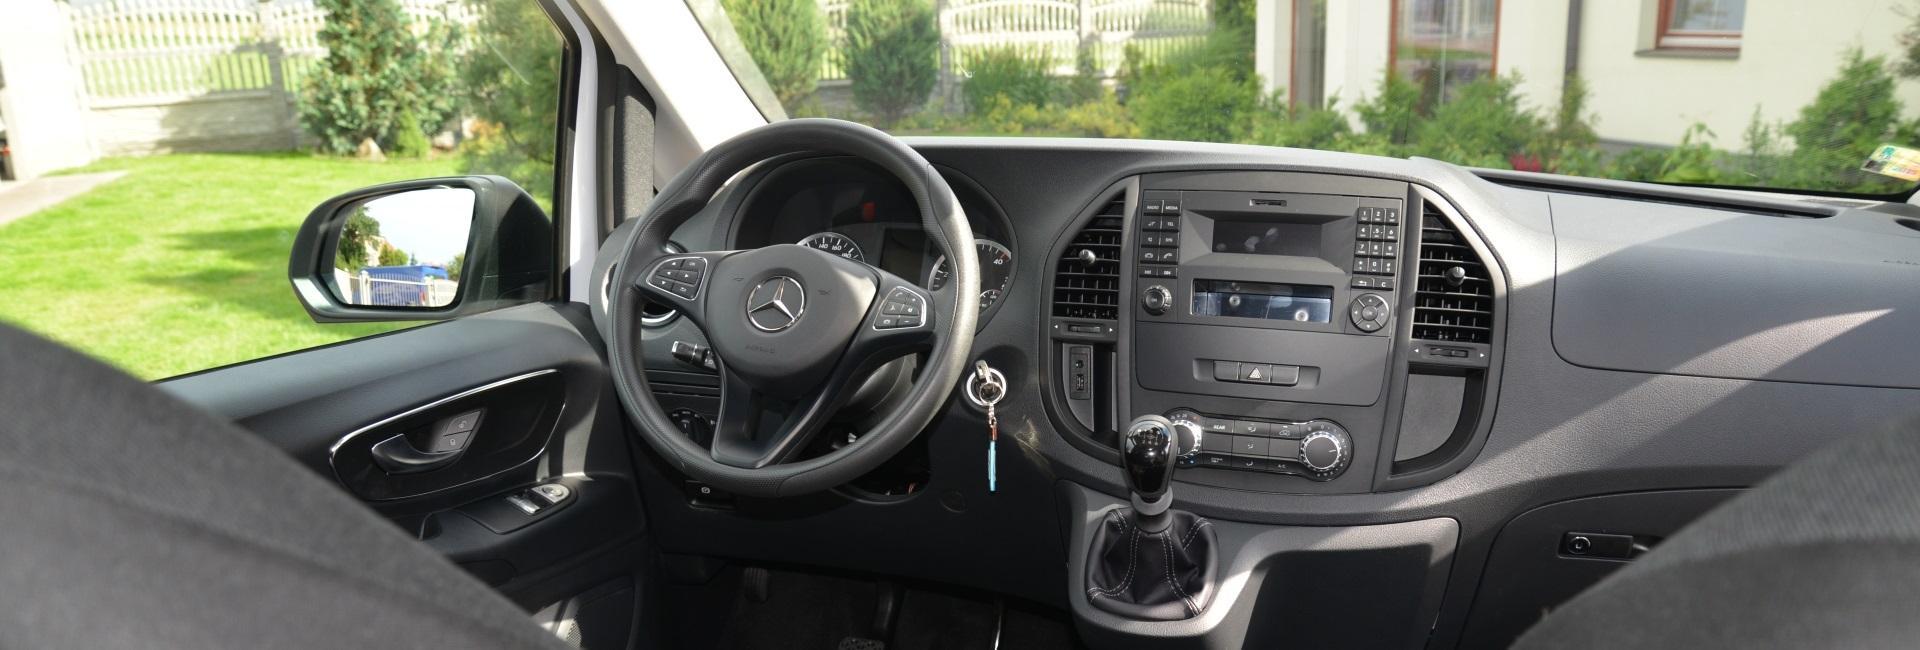 Interiér Mercedes Benz Vito